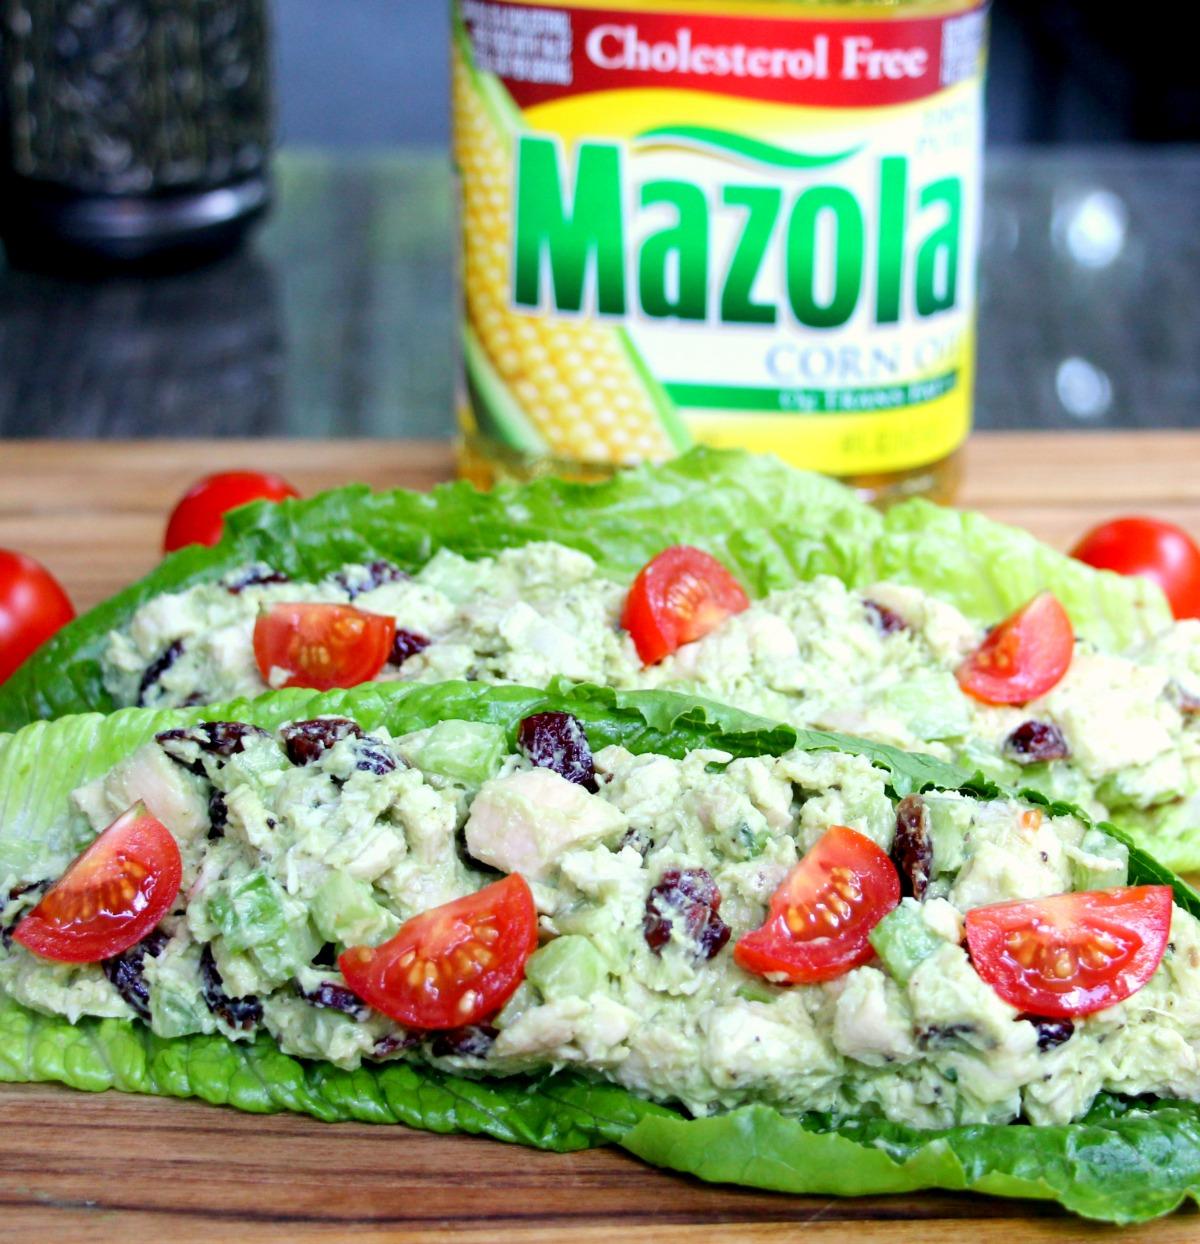 Healthy Chicken Salad With Homemade Avocado Mayo